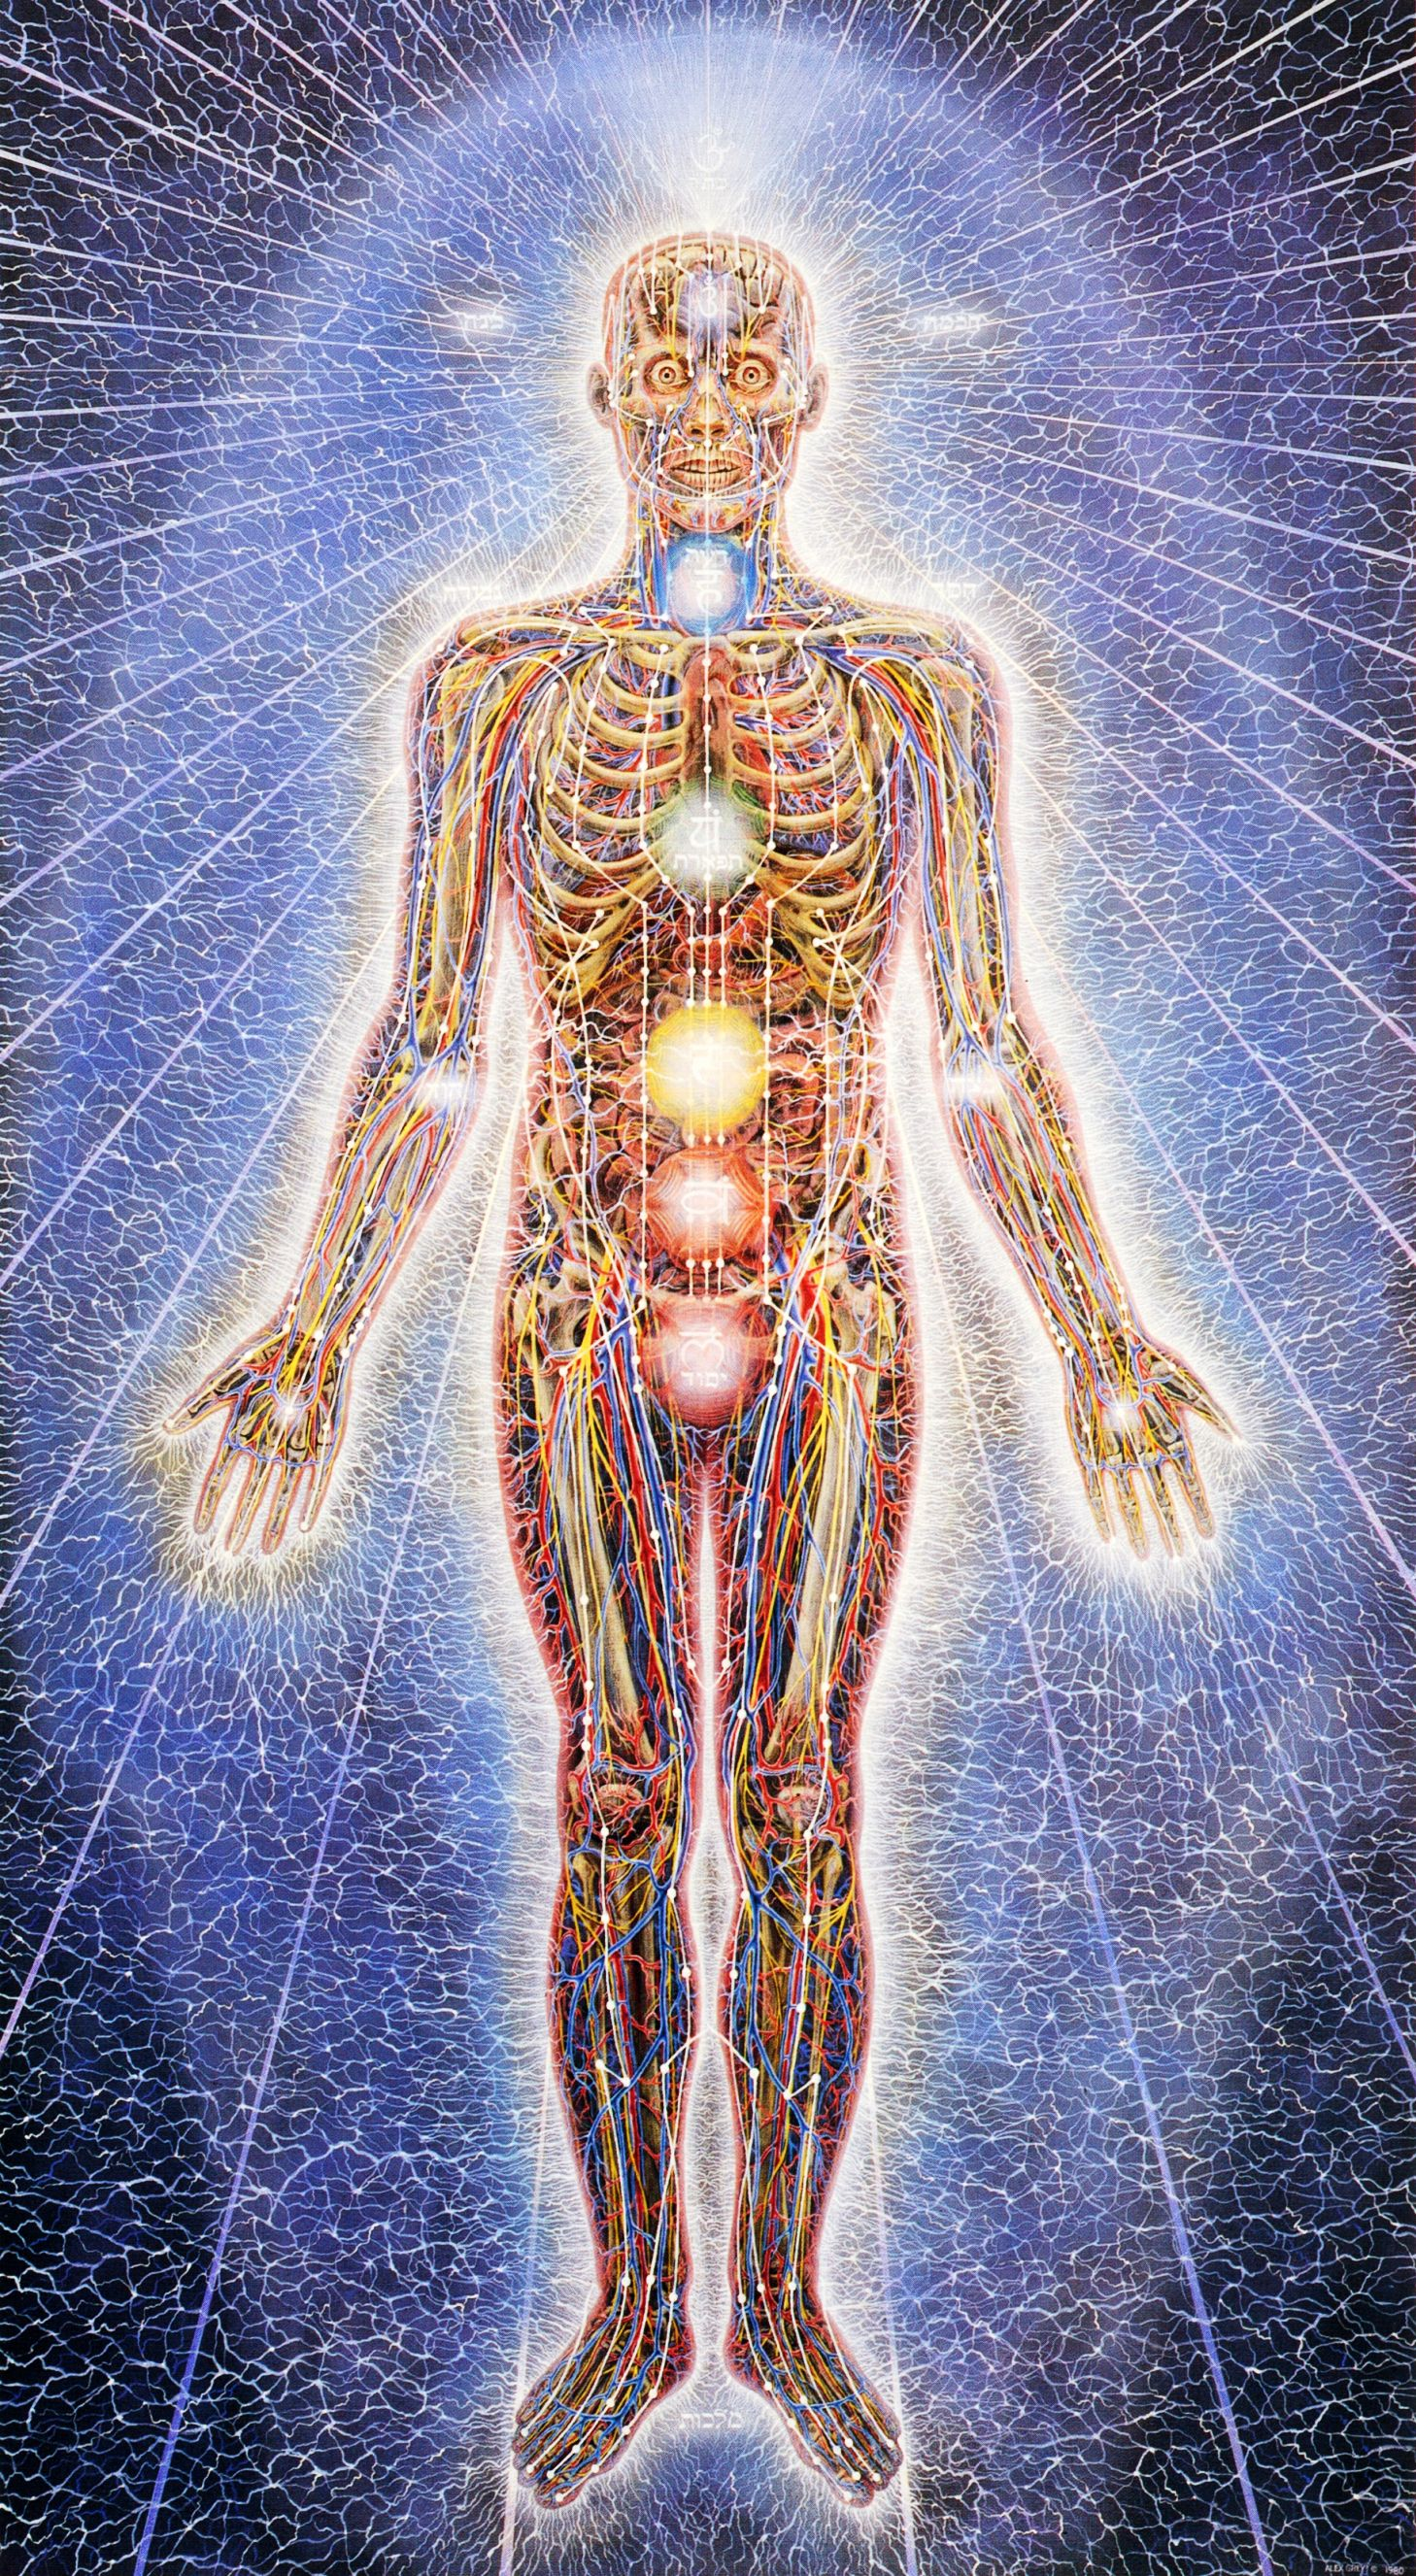 Psychic Energy System | Alex Grey 1980